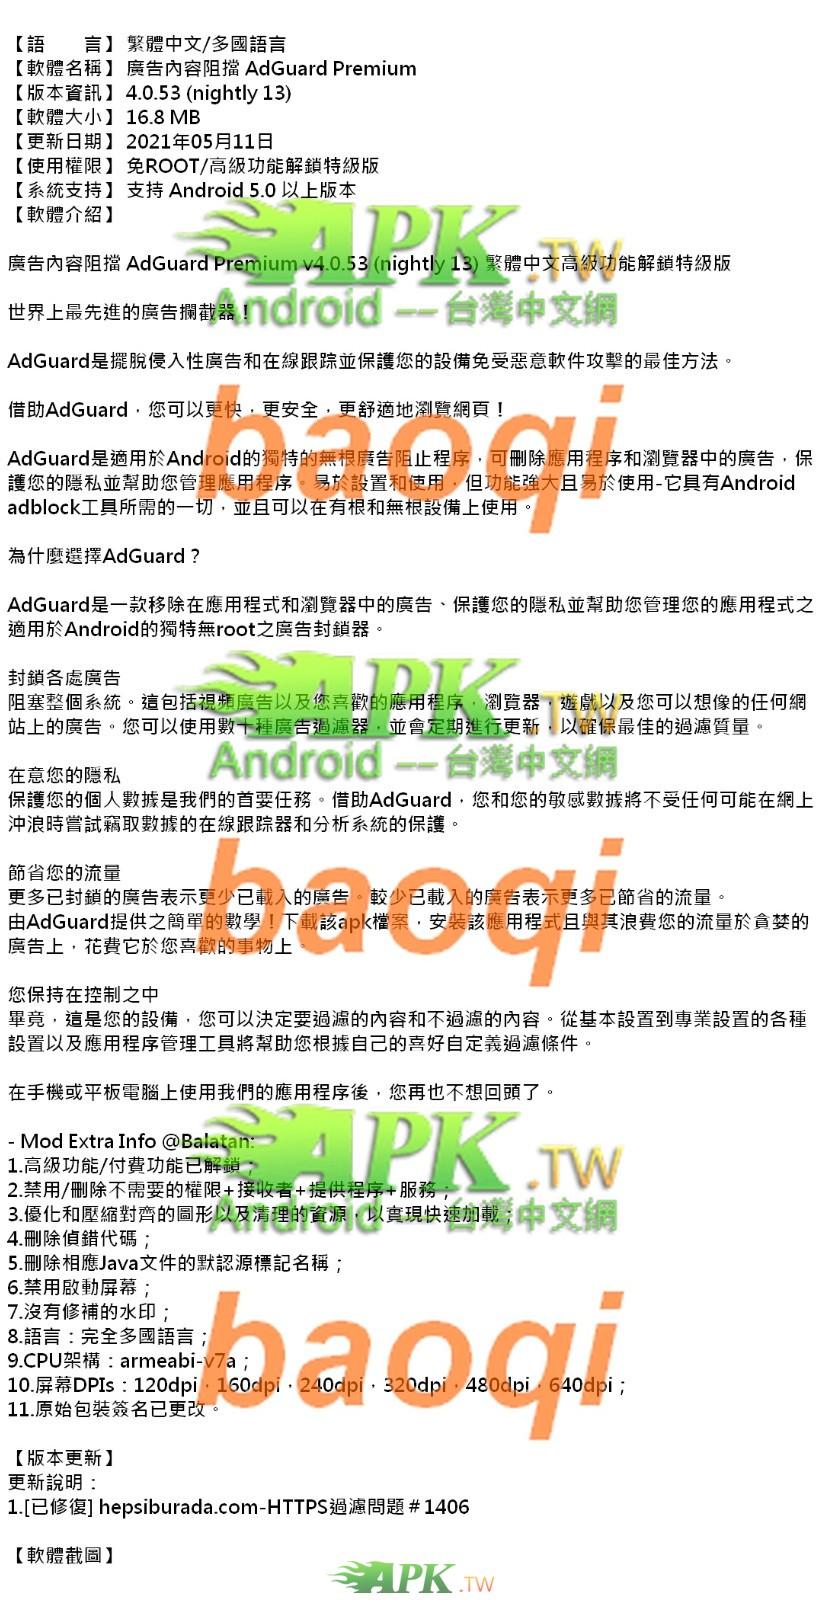 AdGuard_Premium_4.0.53_nightly13_.jpg